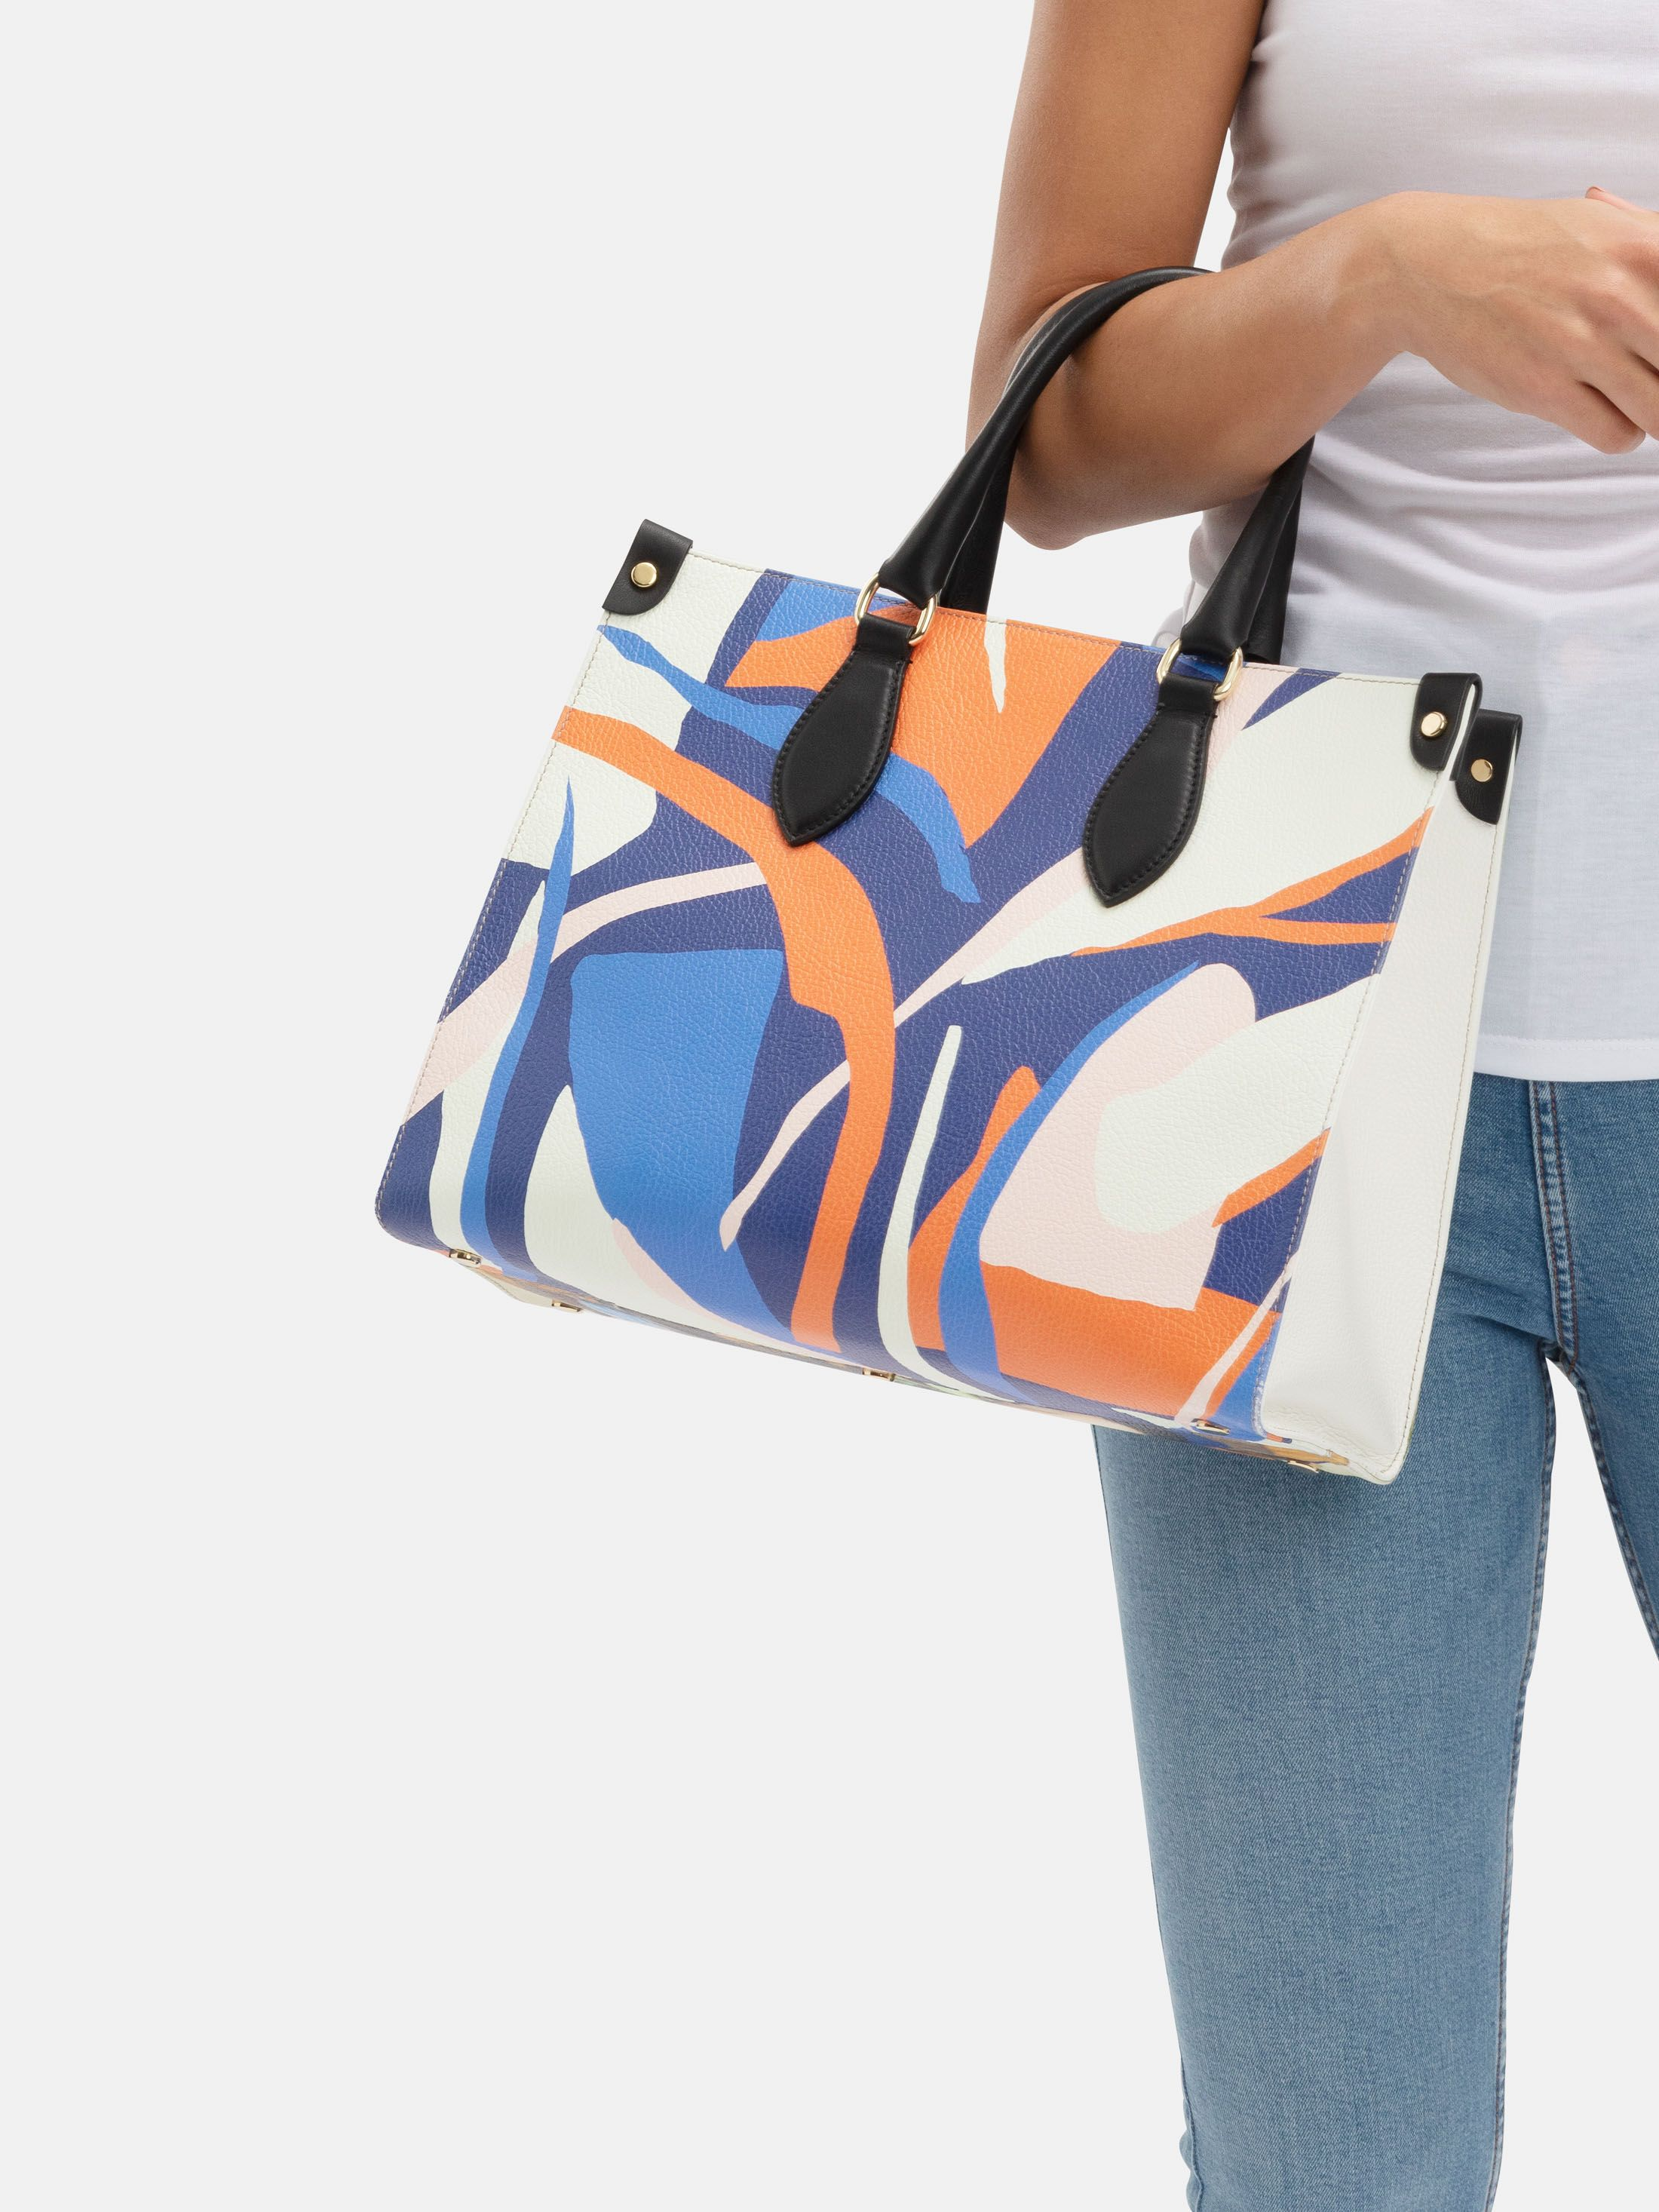 design your own shopper bag design